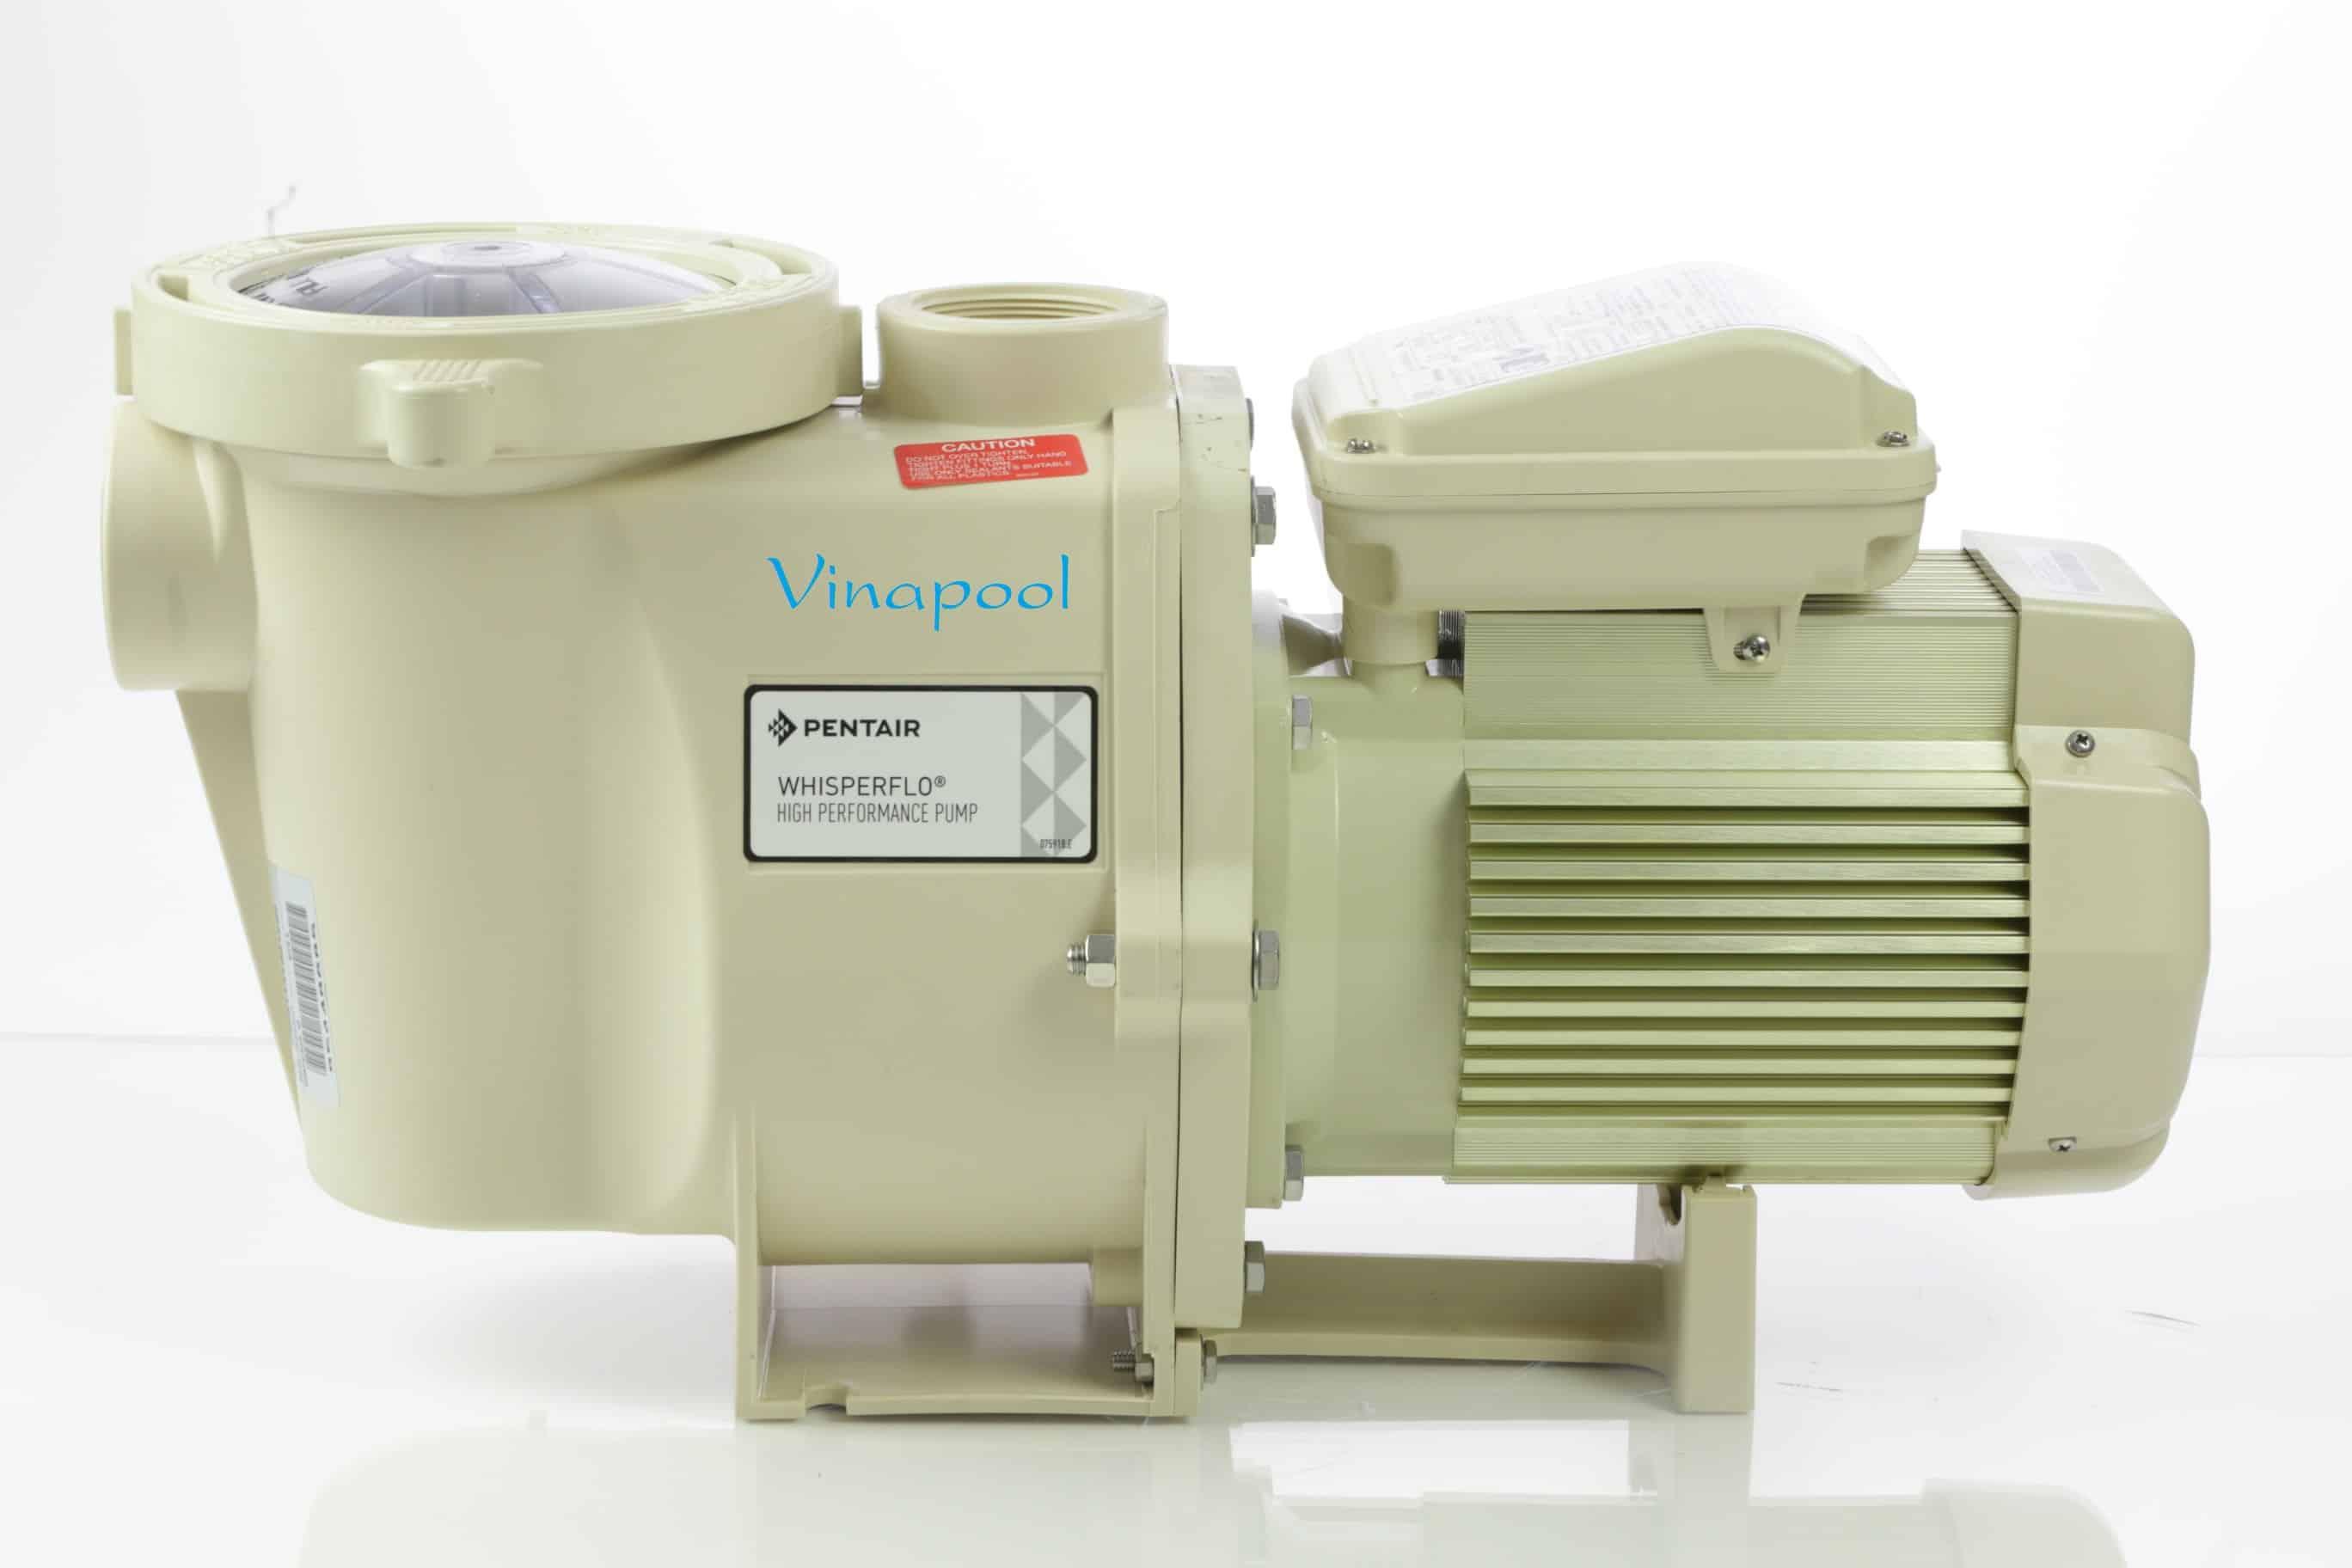 VianPool whisperflo-high-performance-pump